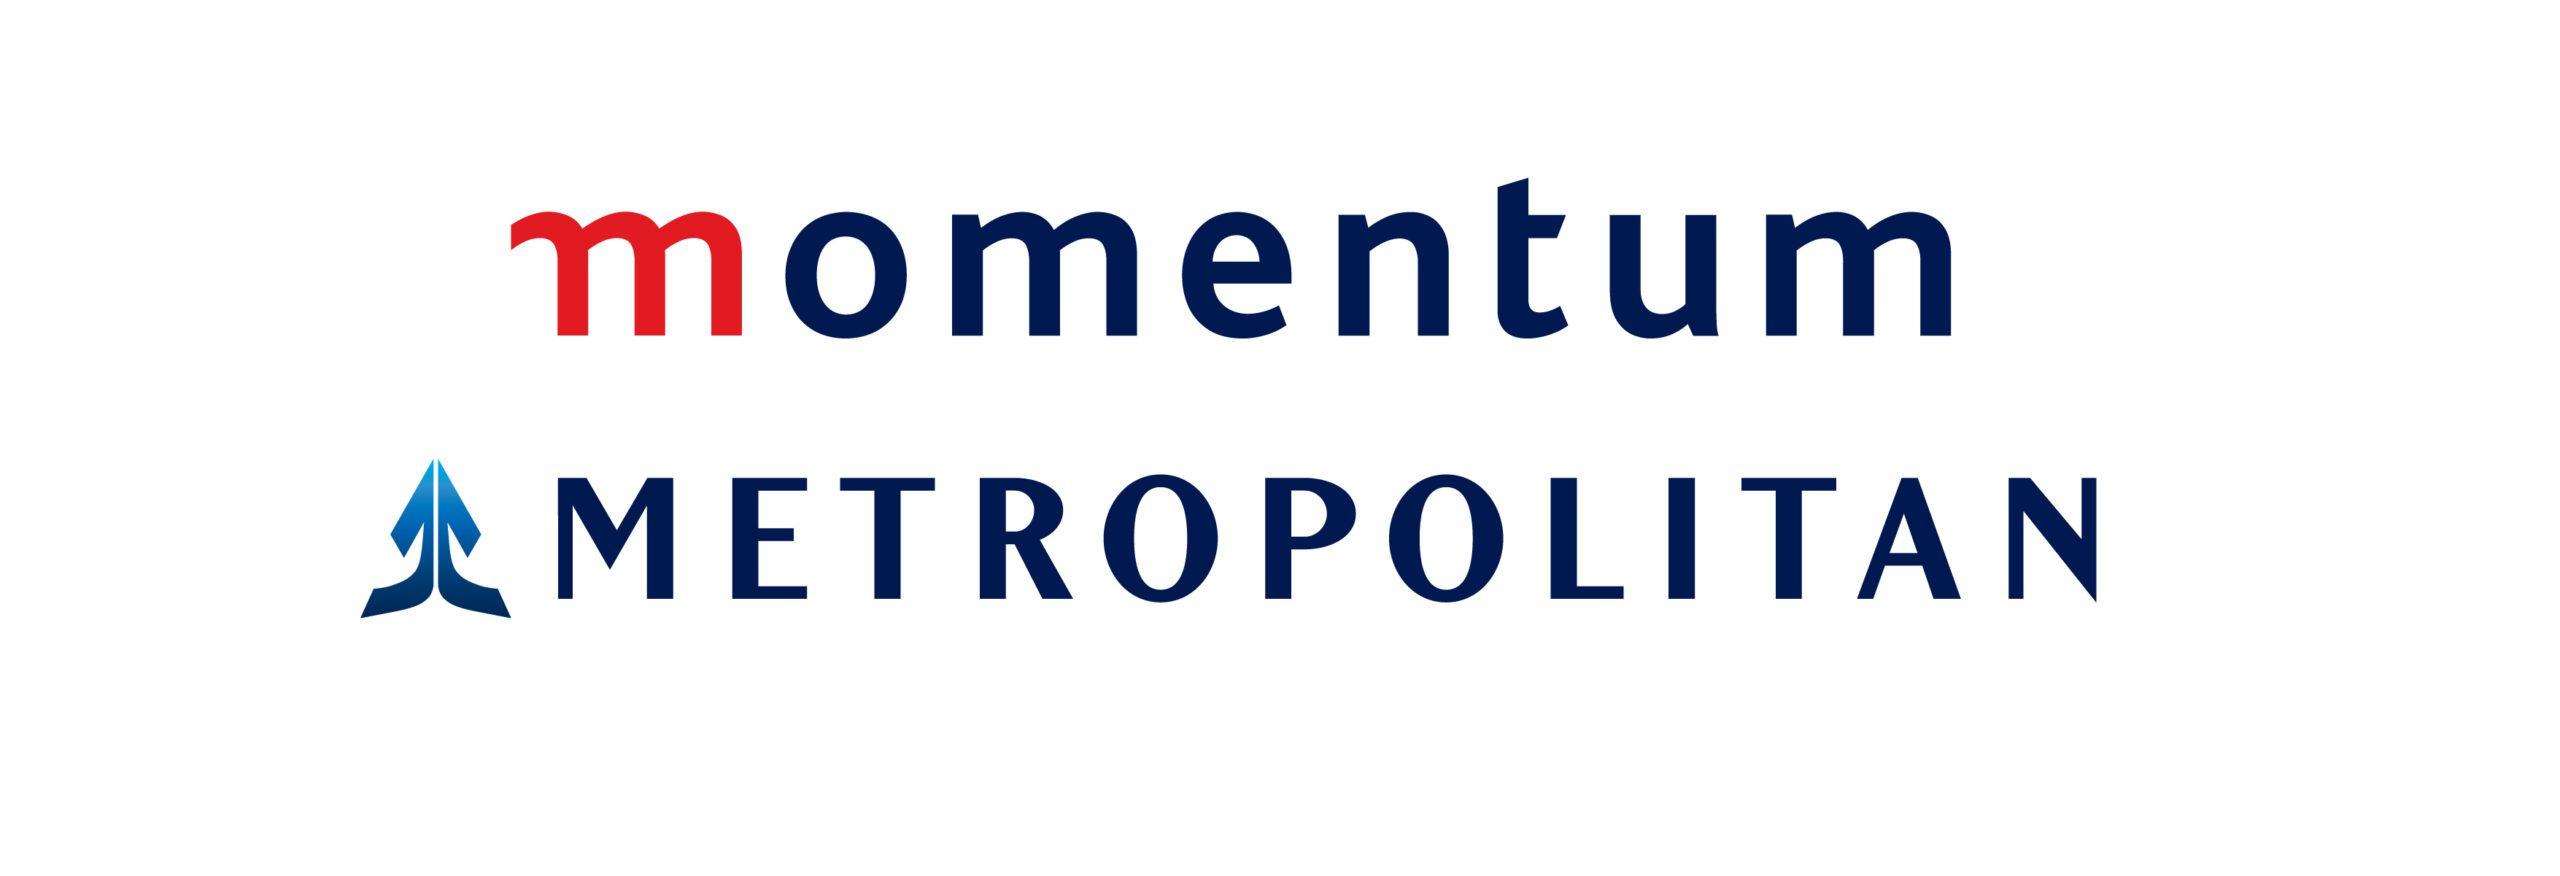 Momentum Metropolitan Holdings Limited